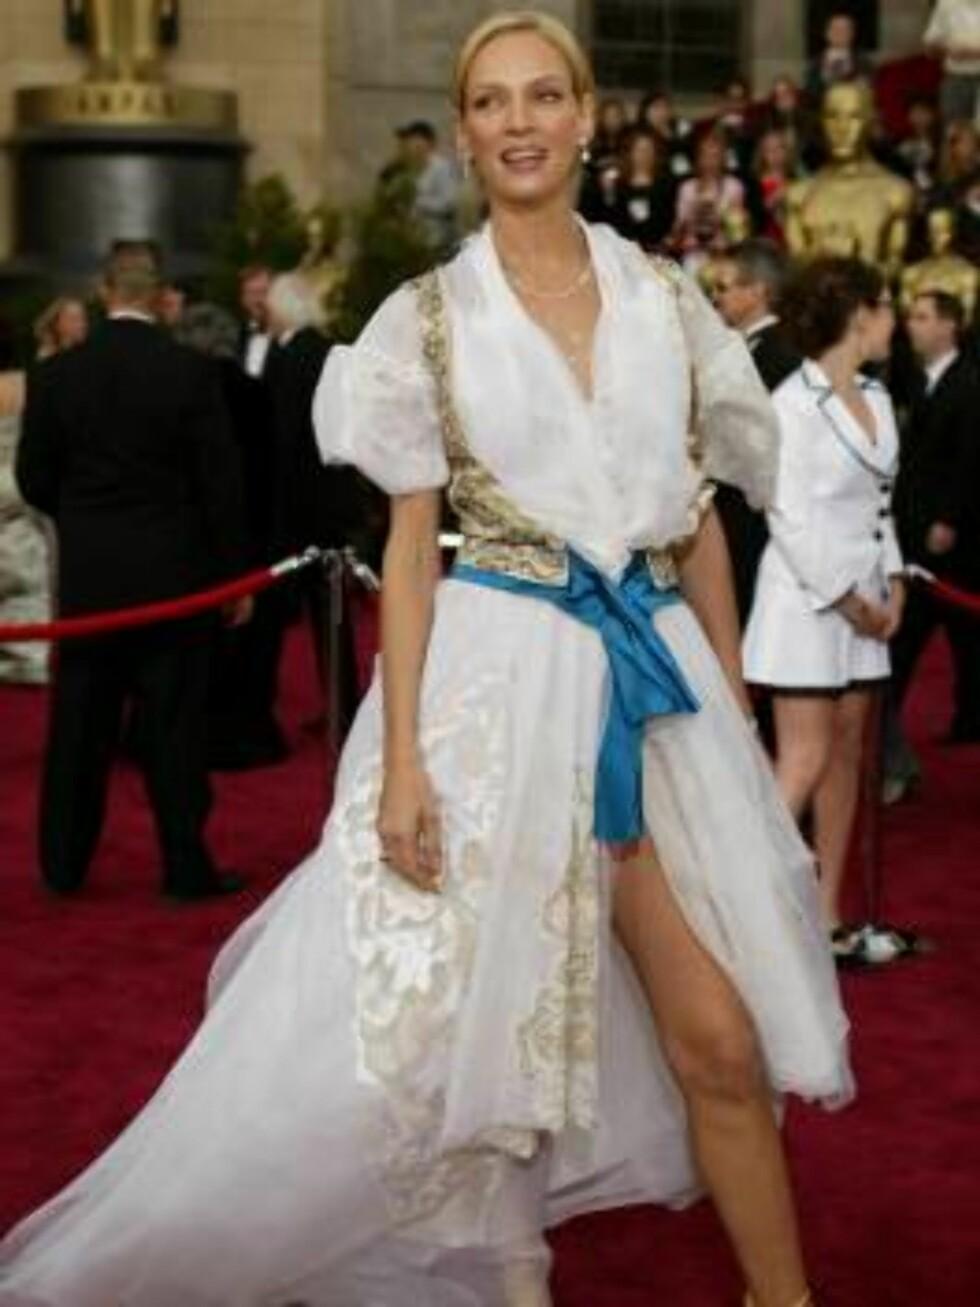 Uma Thurman arrives for the 76th annual Academy Awards Sunday, Feb. 29, 2004, in Los Angeles. Thurman will be a presenter during the telecast. (AP Photo/Joe Cavaretta) Foto: AP